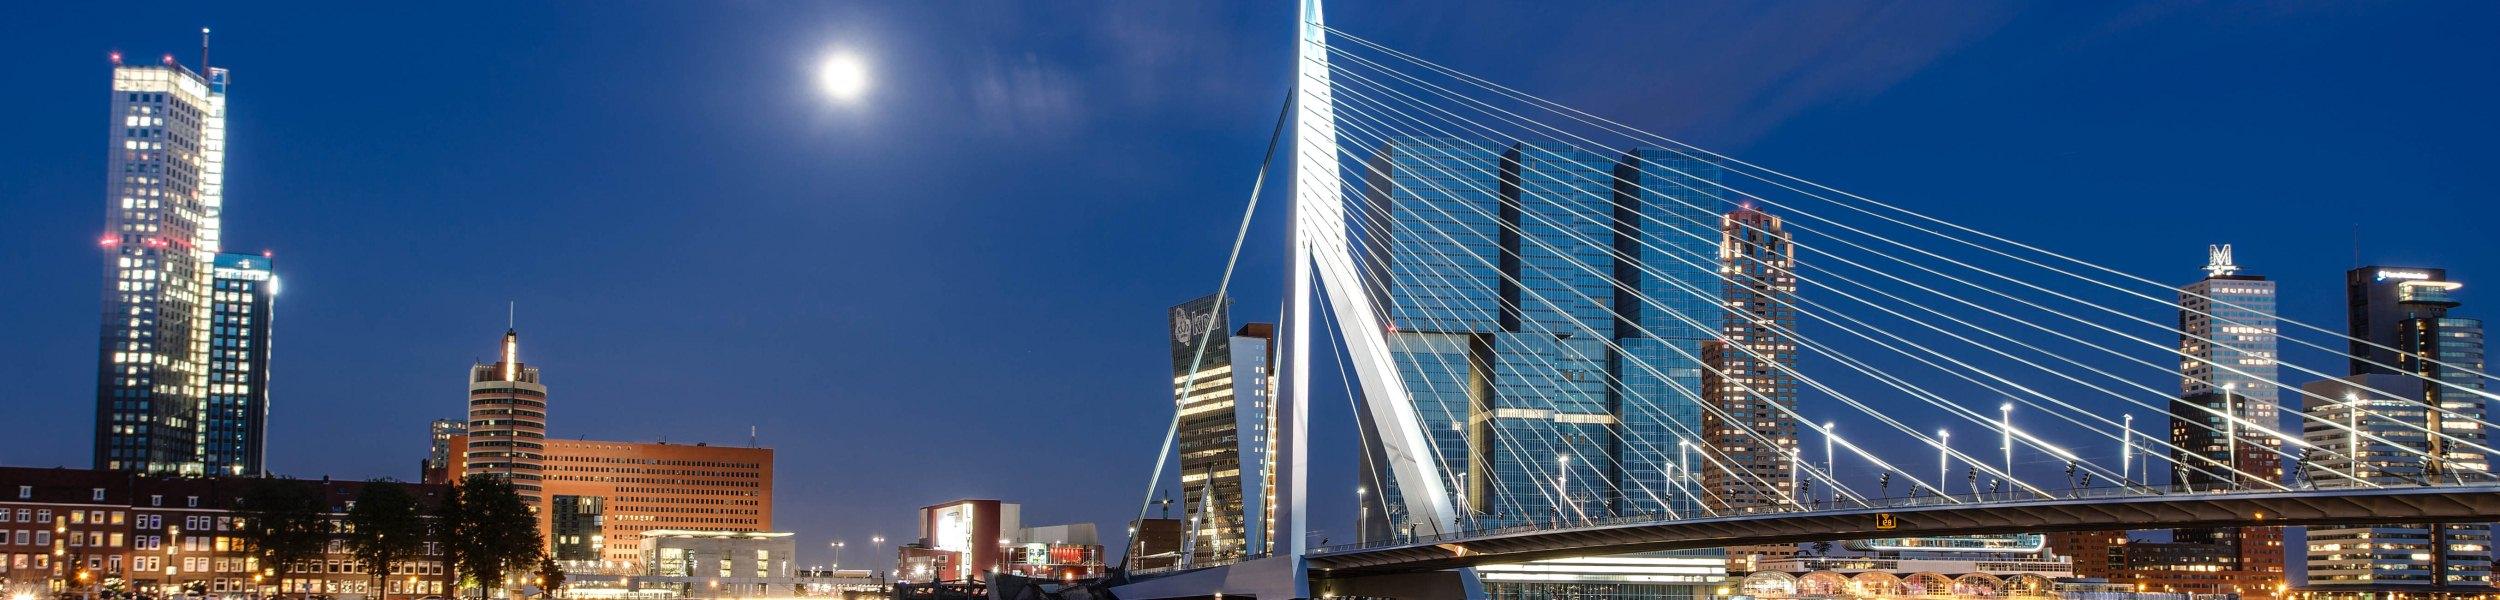 Senior Software Engineer Rotterdam, the Netherlands